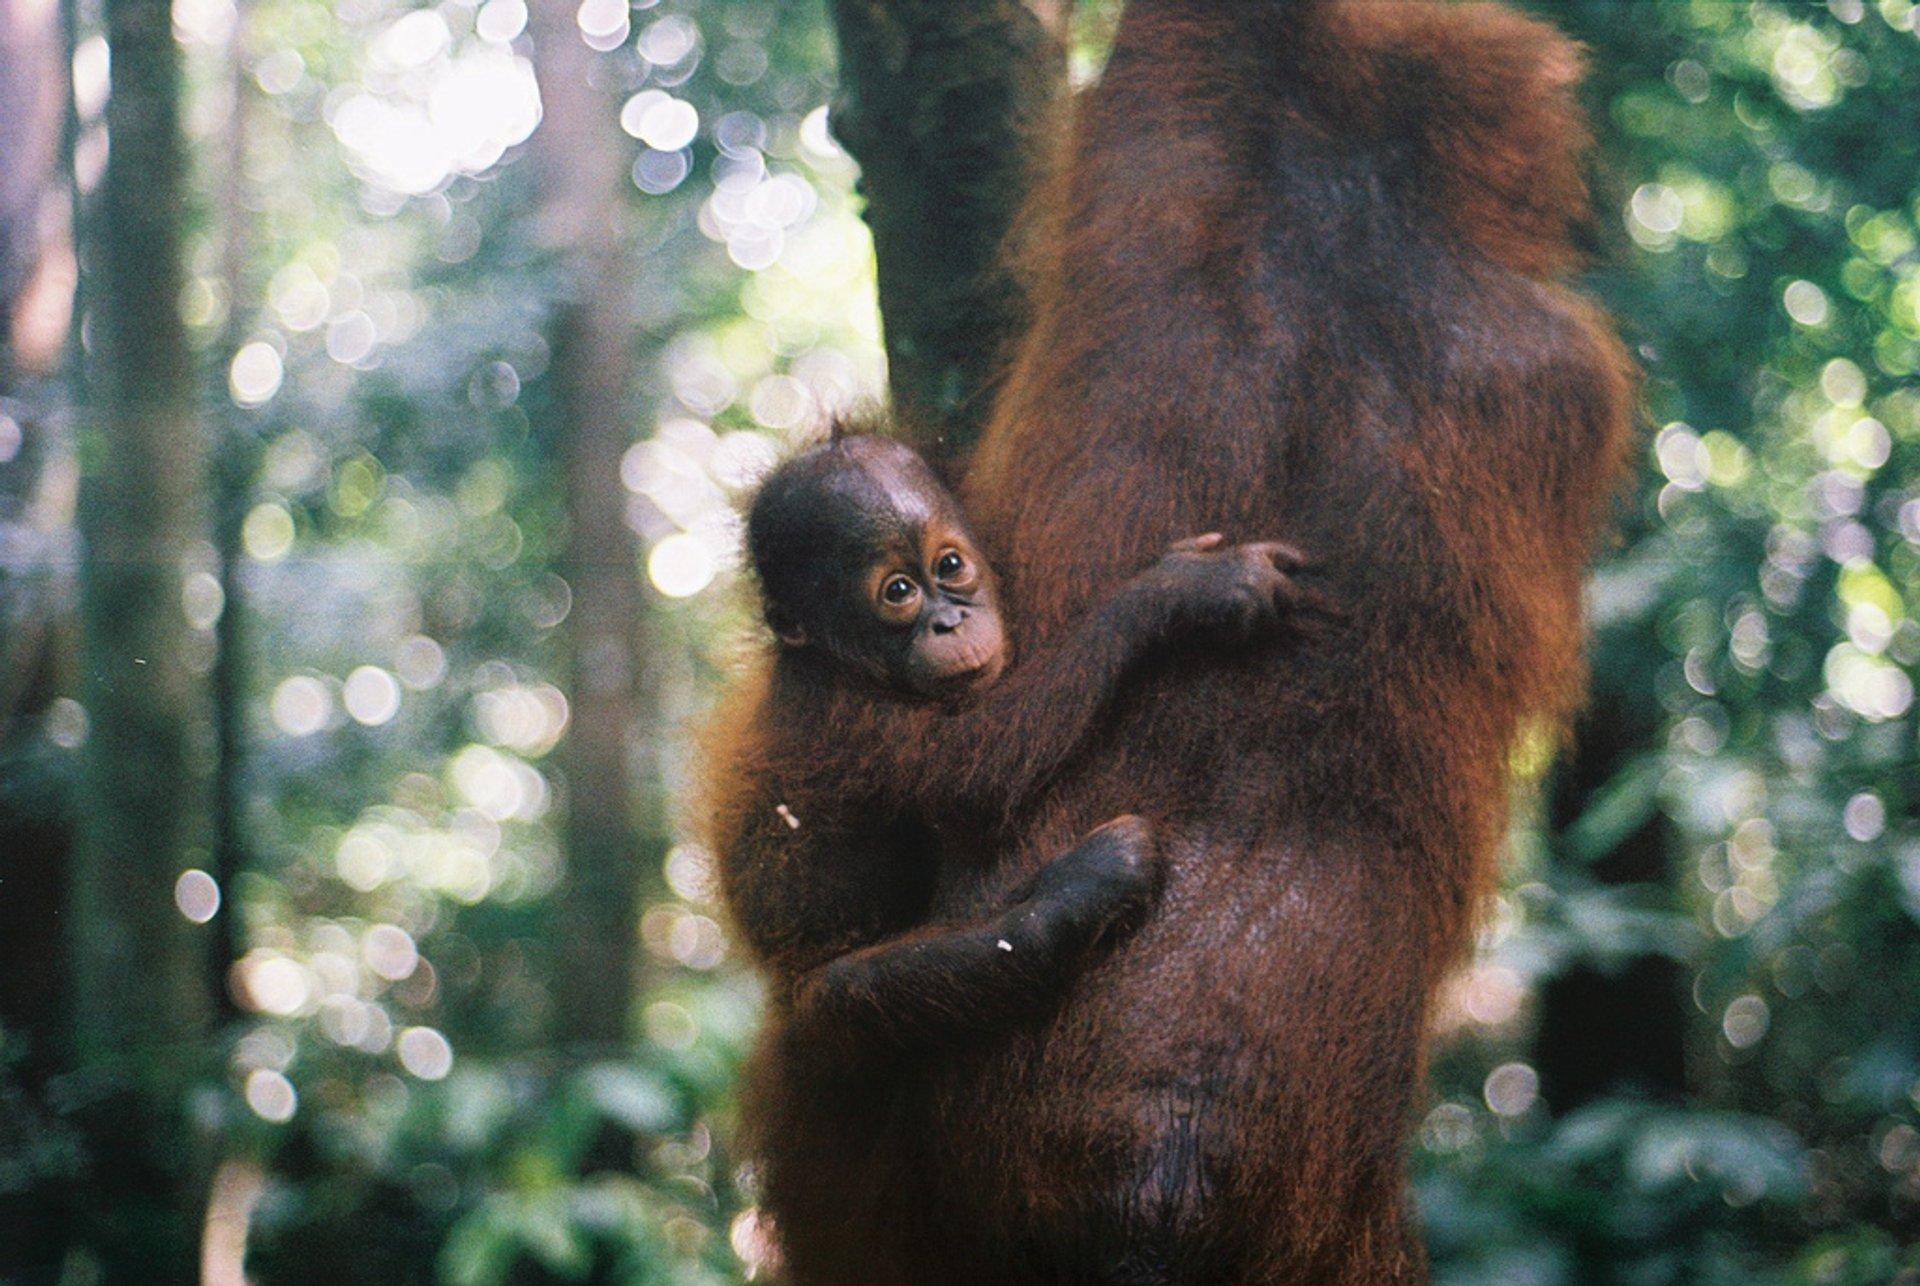 Watching Orangutans in Malaysia - Best Season 2020